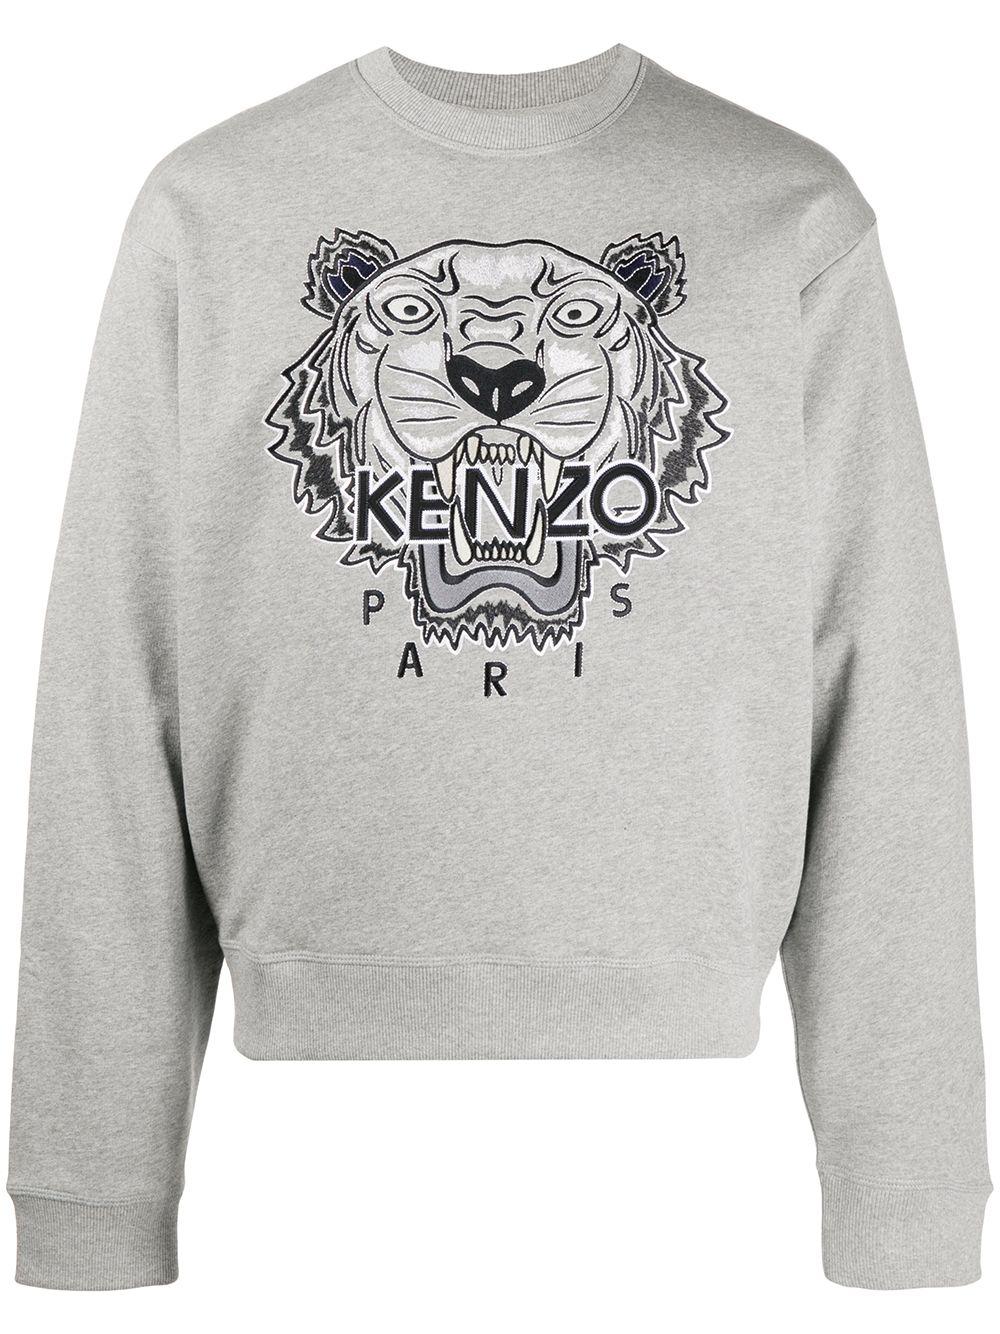 Kenzo Sweatshirt mit Logo-Stickerei - Grau